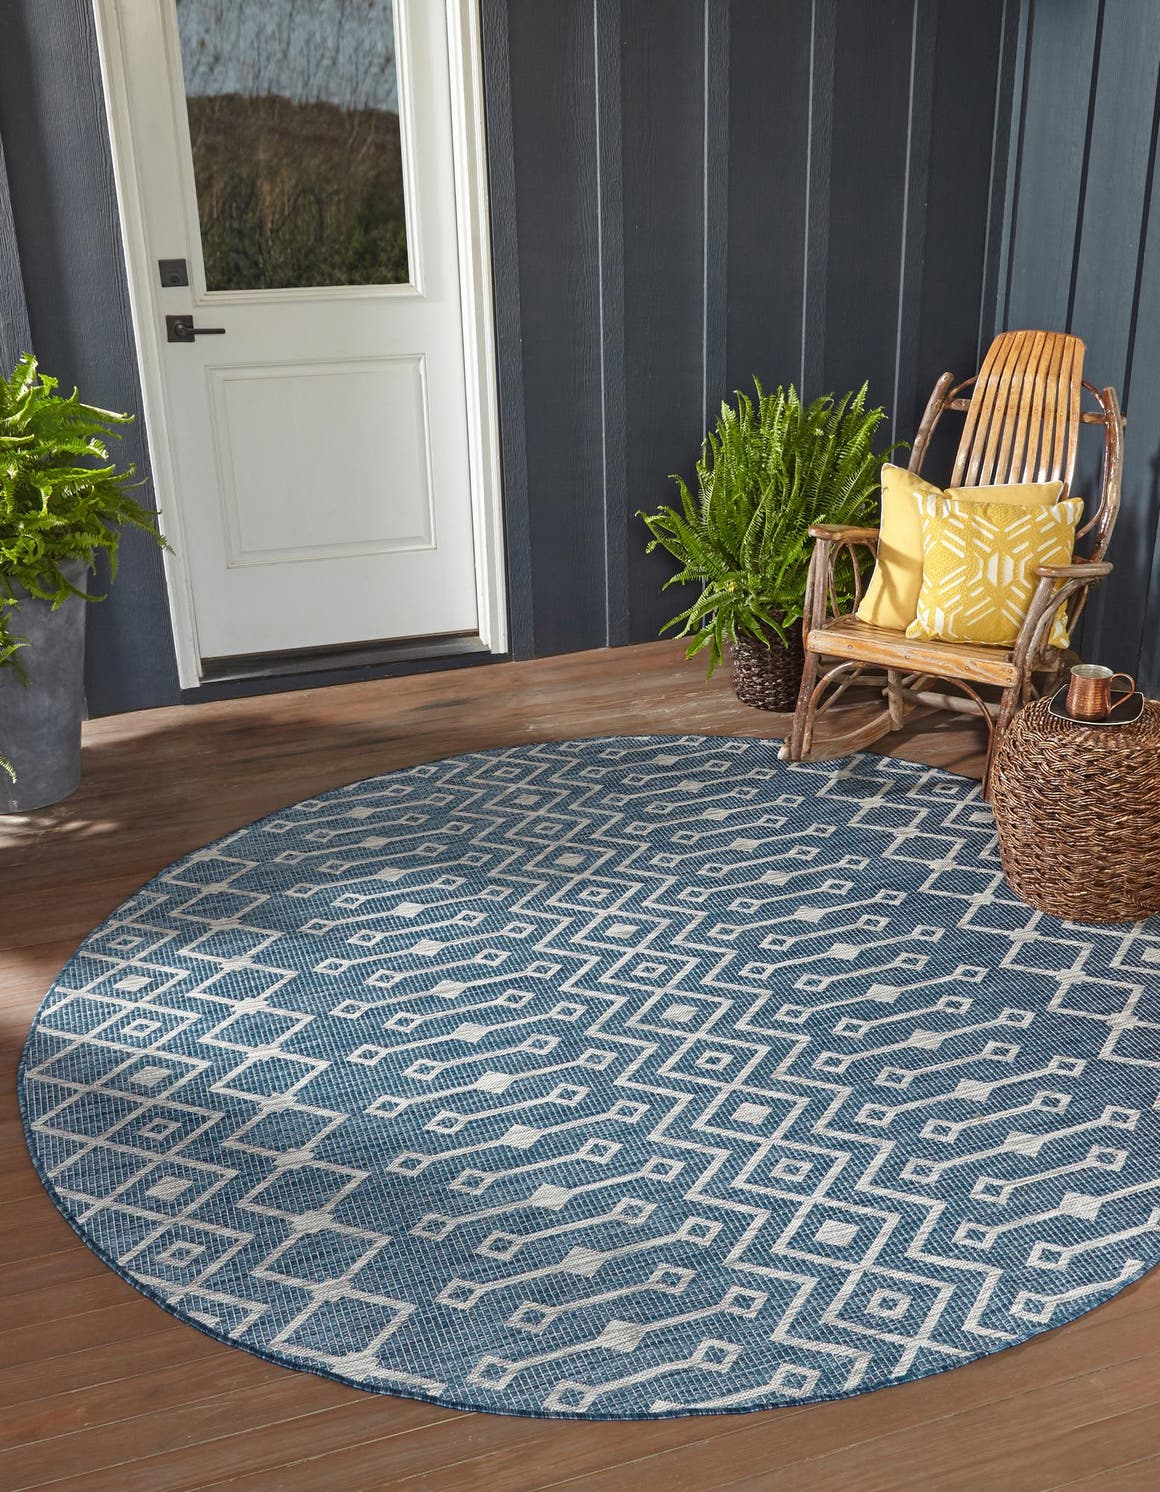 3' x 3' Outdoor Trellis Round Rug main image